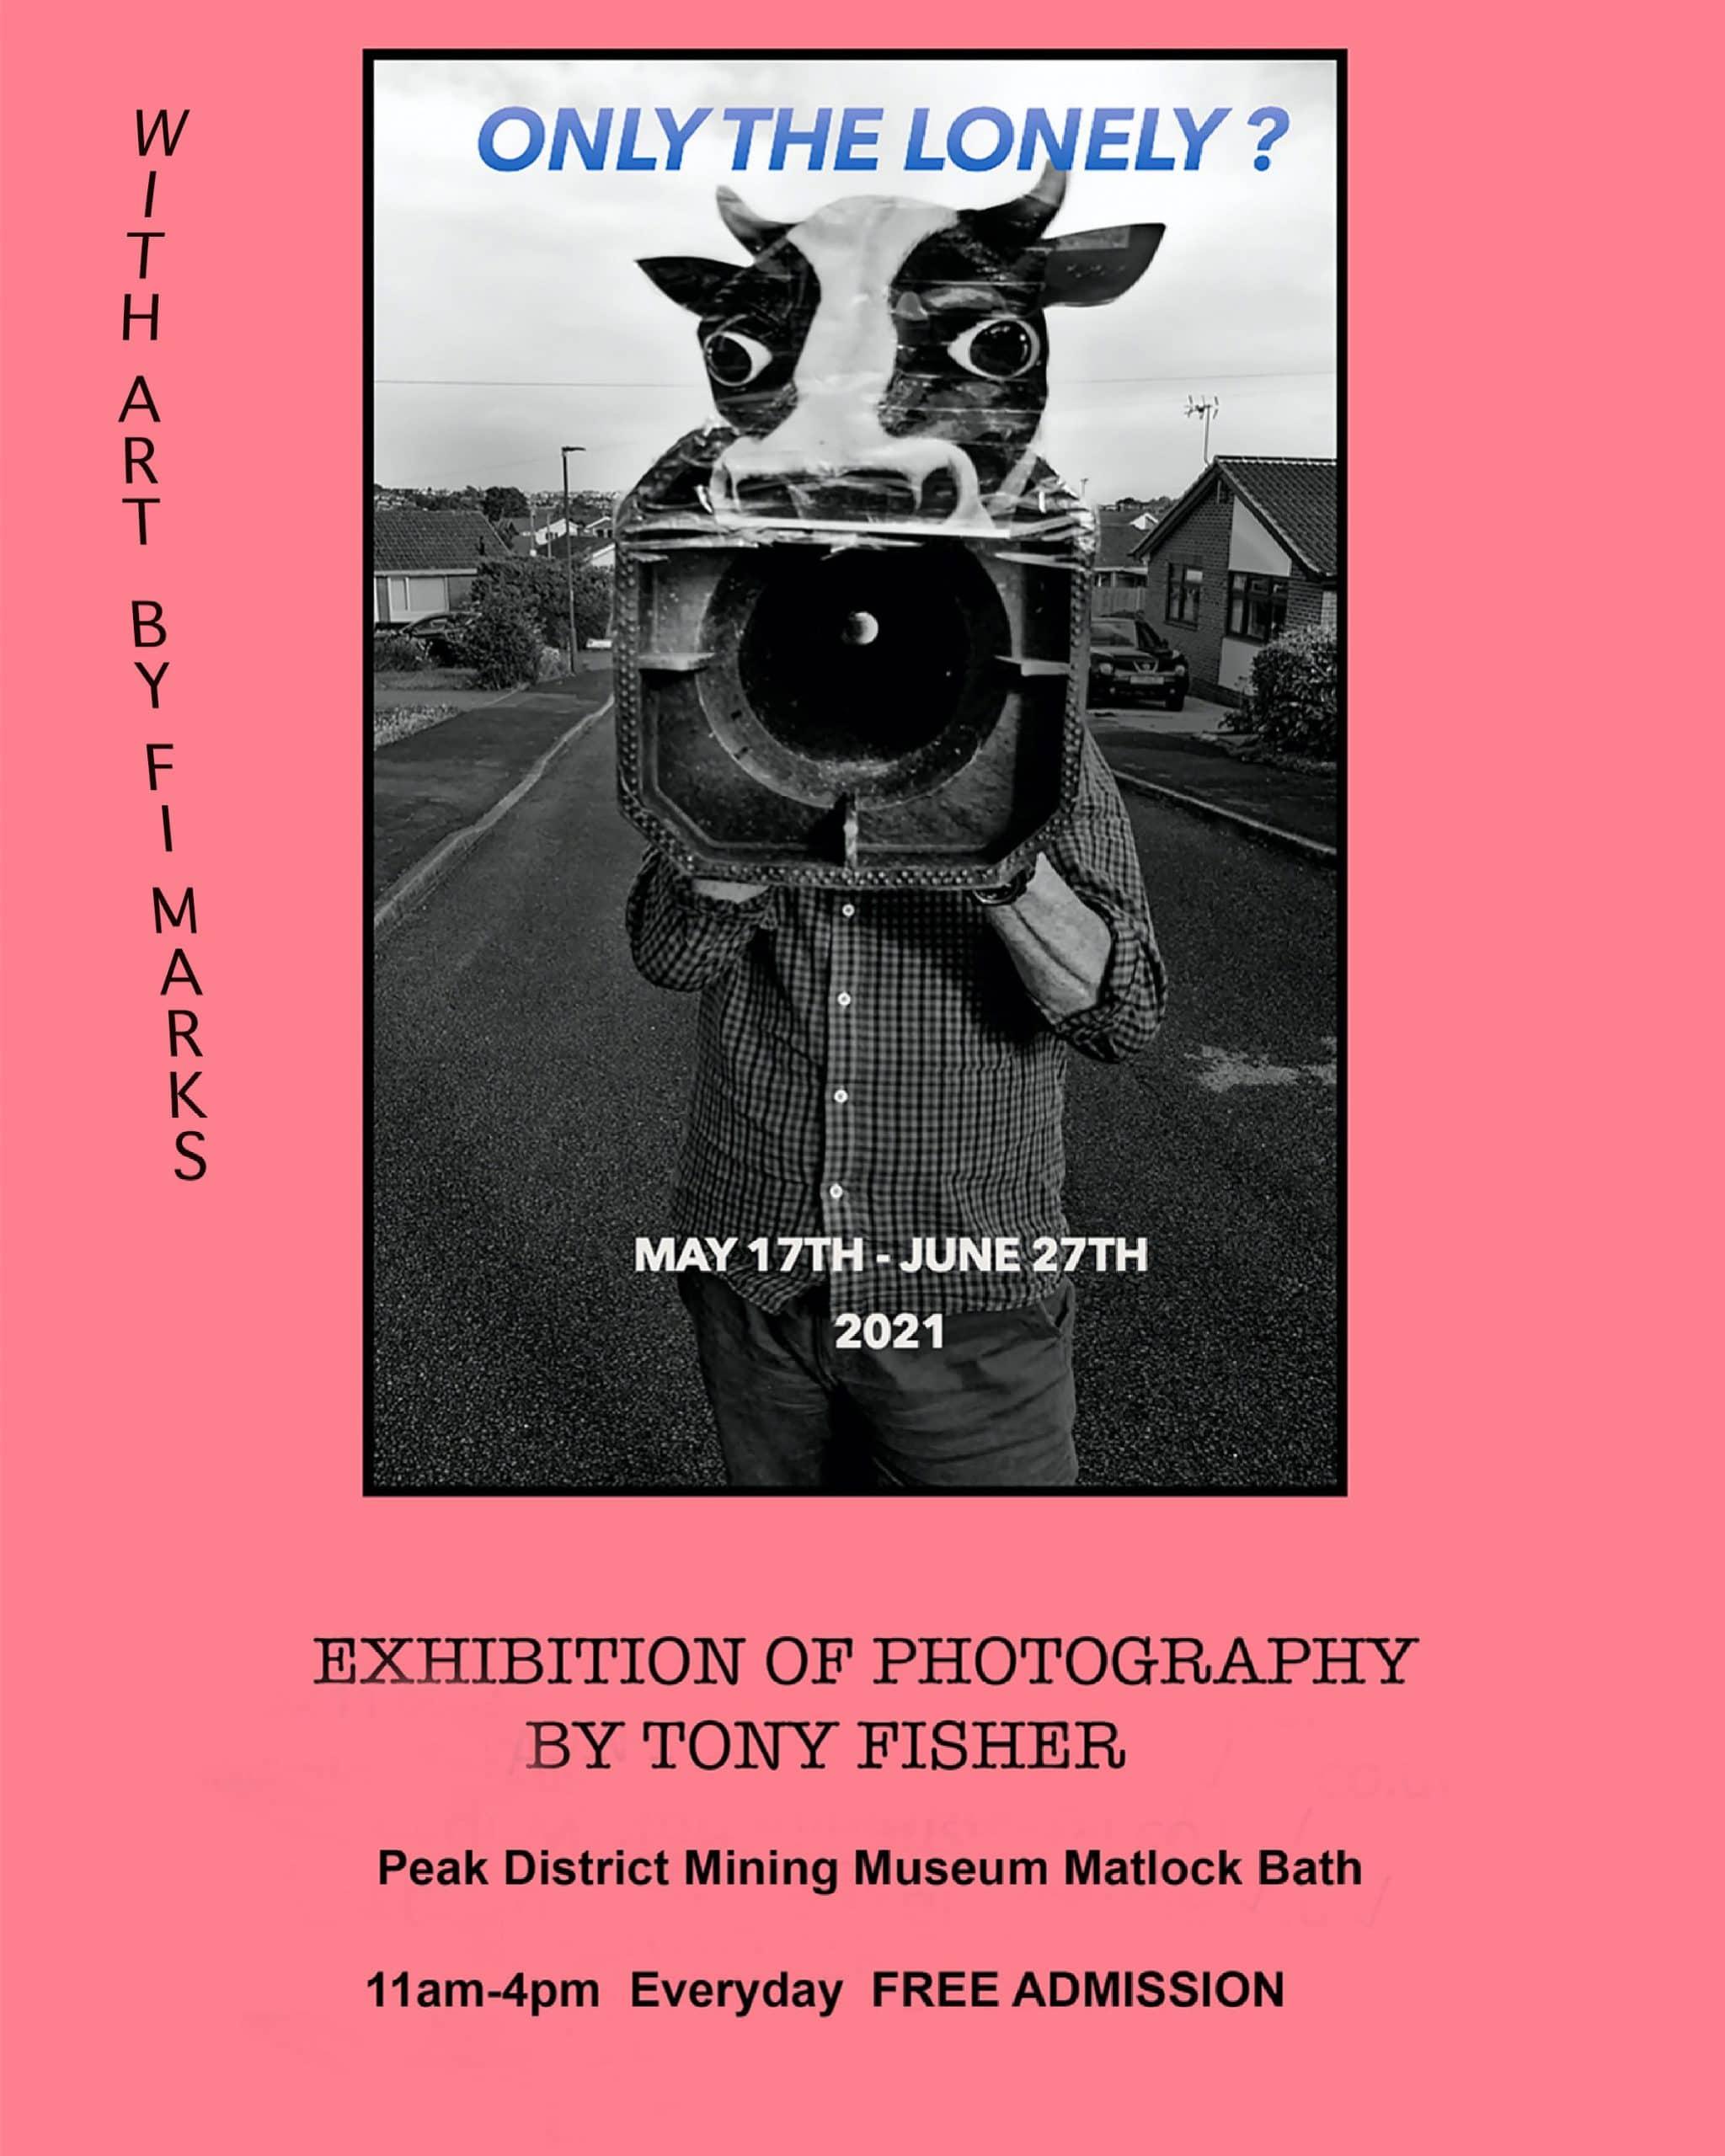 Exhibition at Peak District